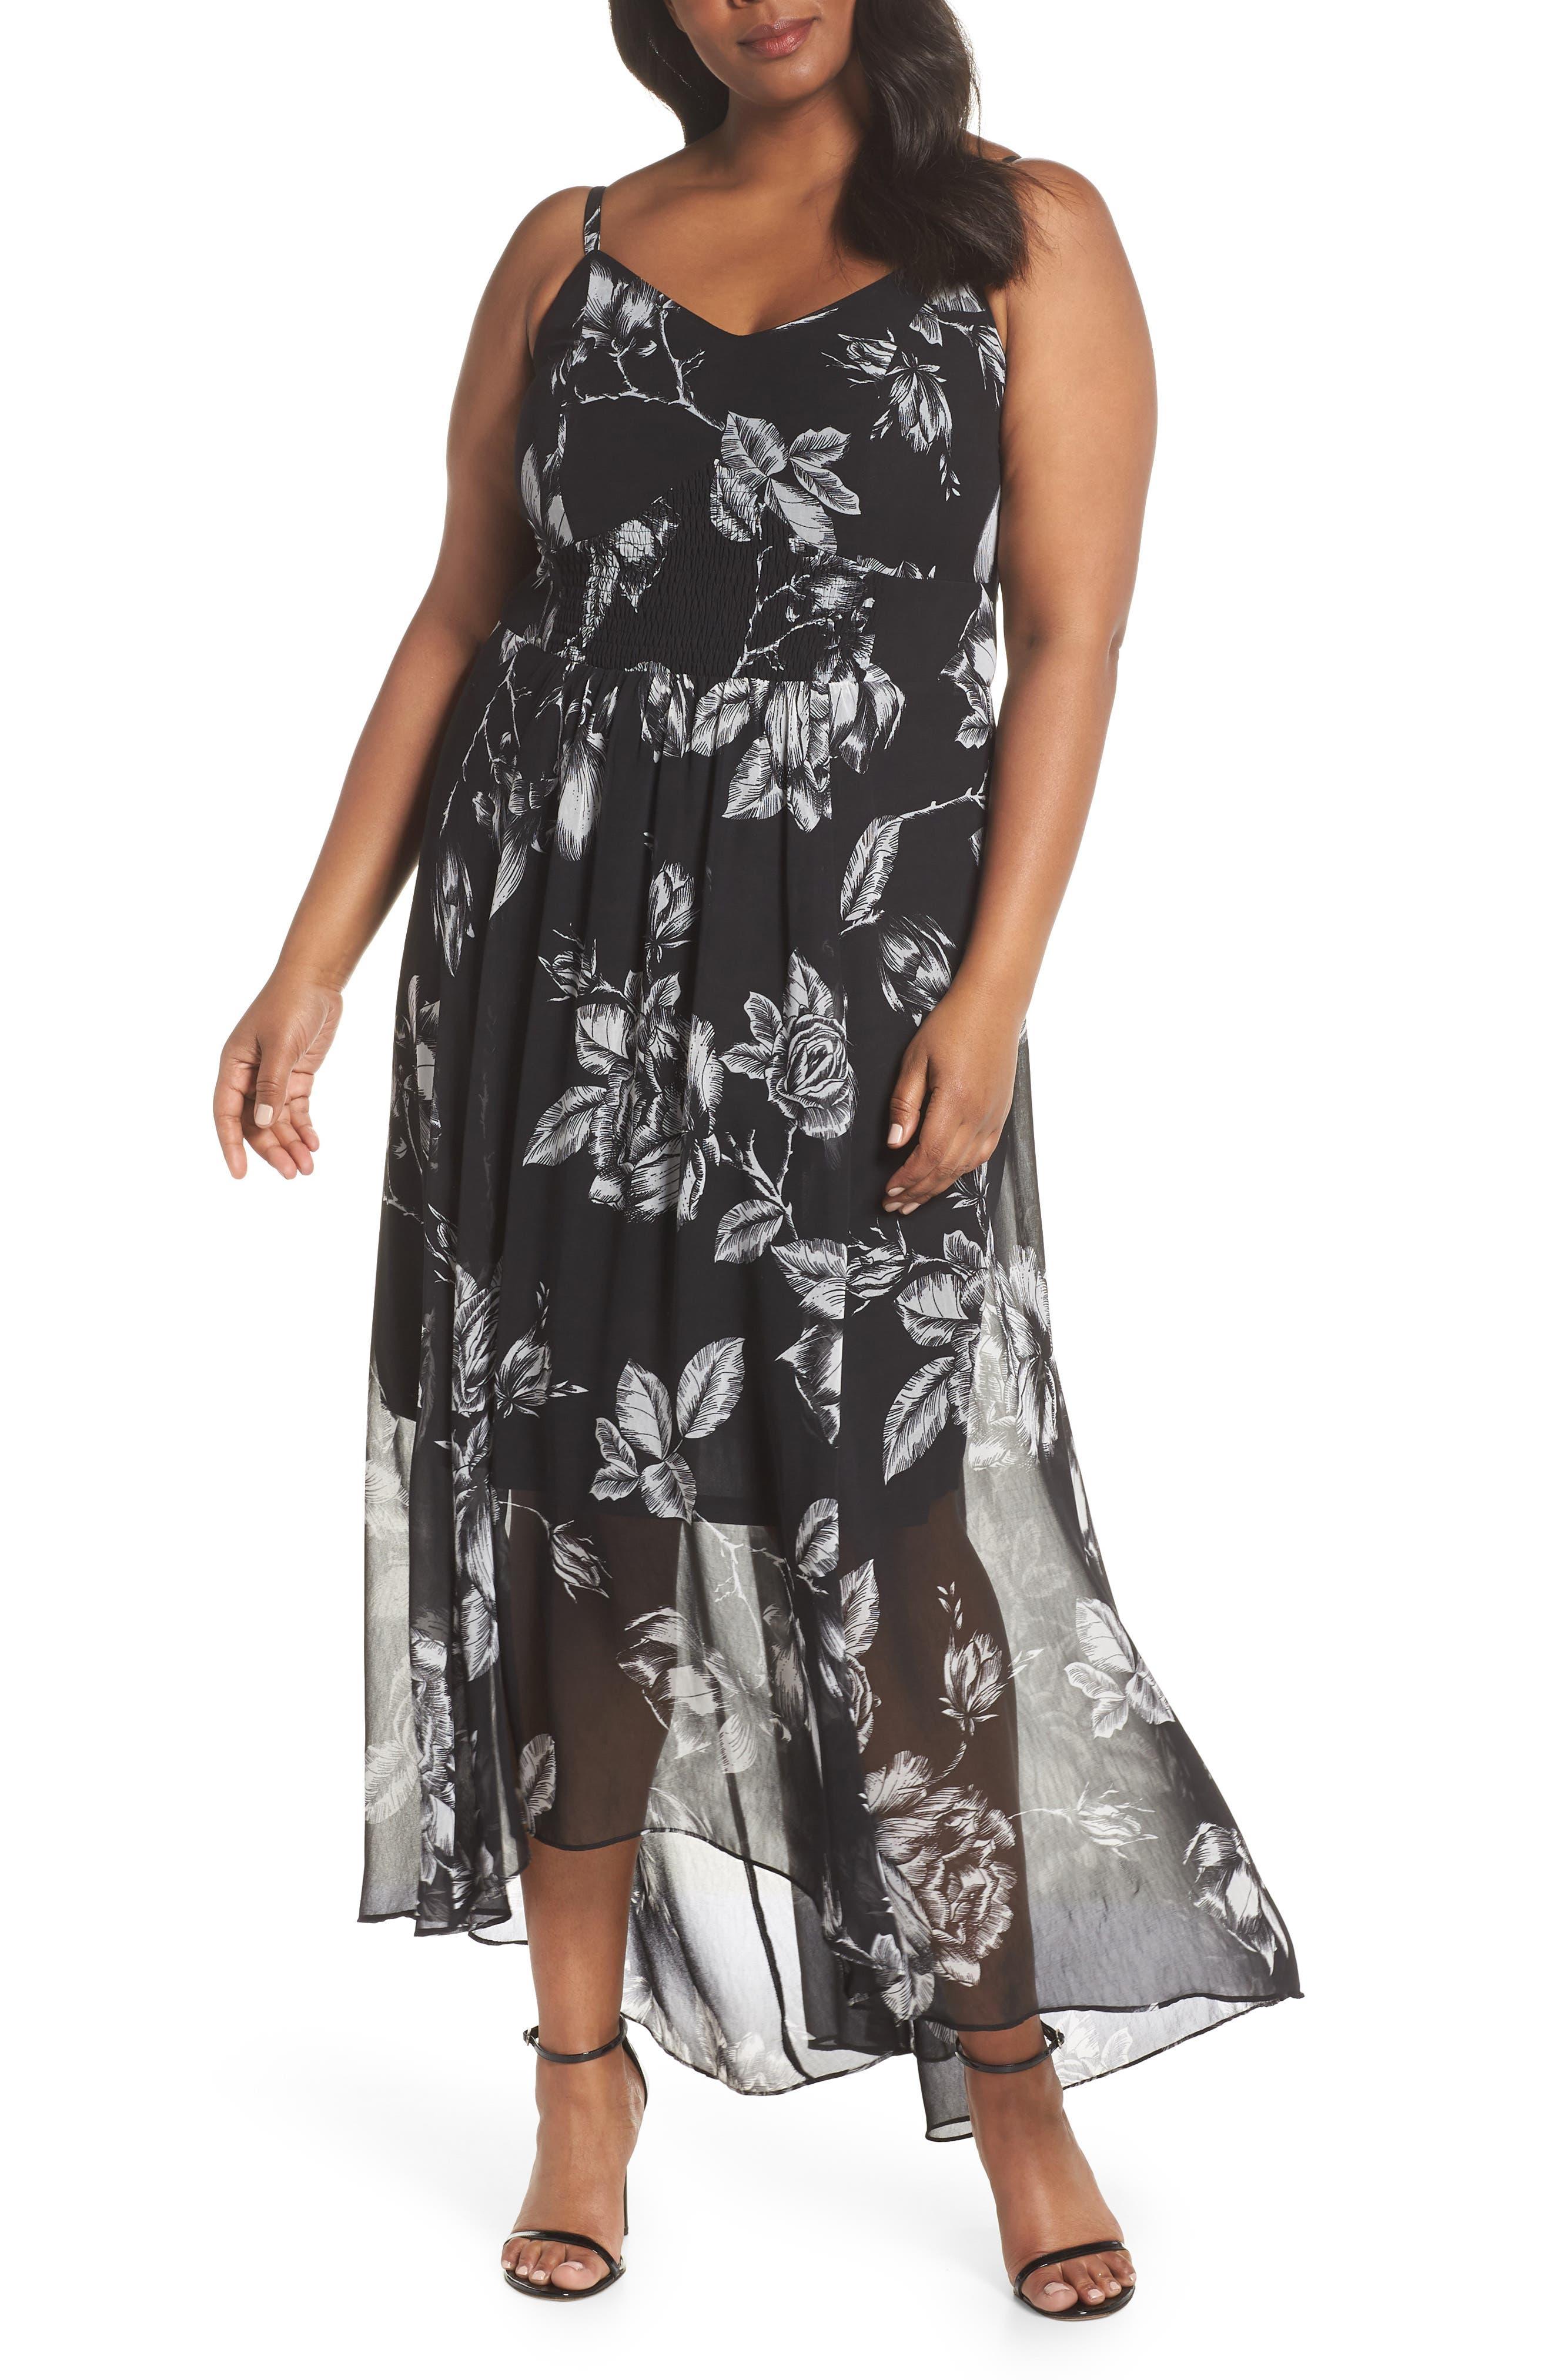 Plus Size City Chic Mono Rose Maxi Dress, Black